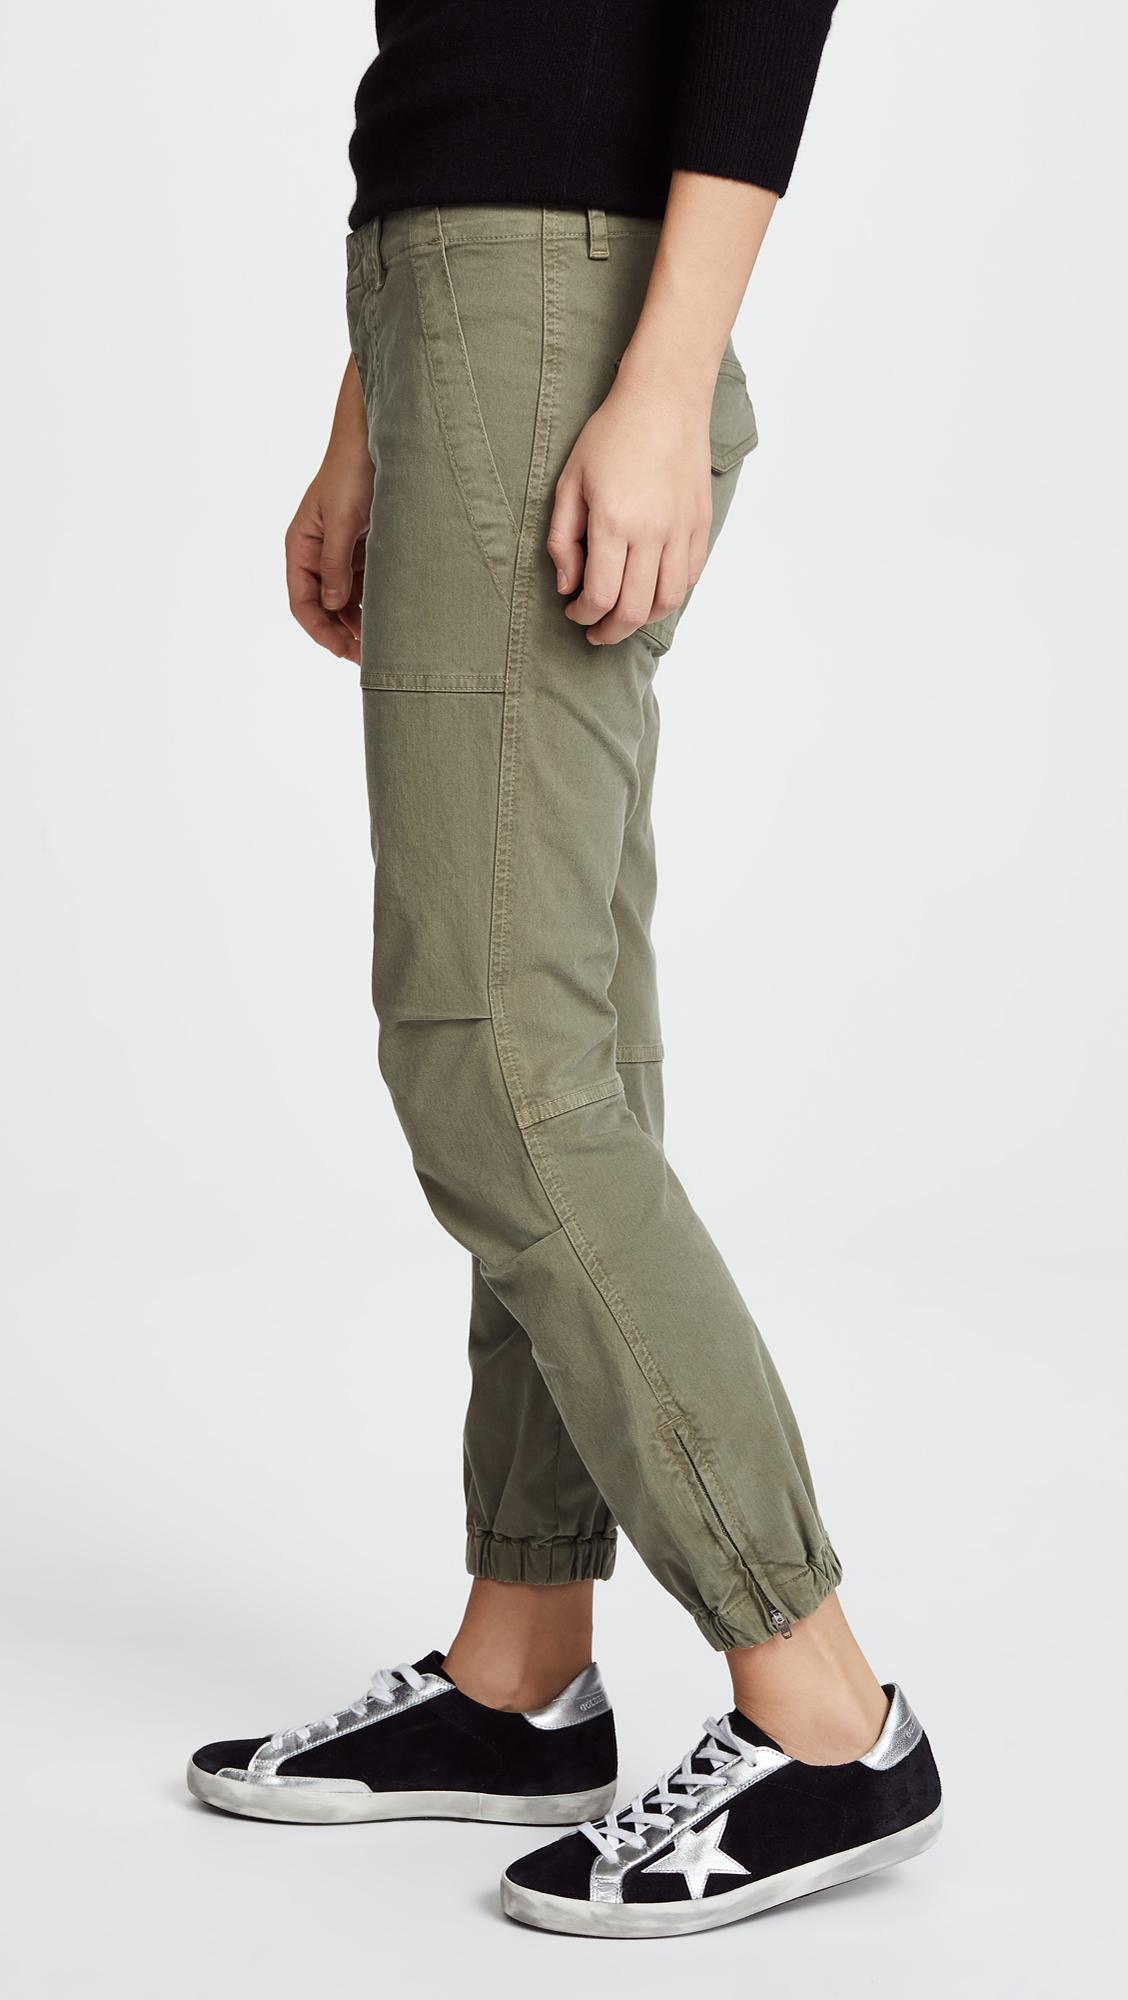 militar cultivo franceses Lotan para Pantalones cargo de Nili mujer x1RfqTpaw